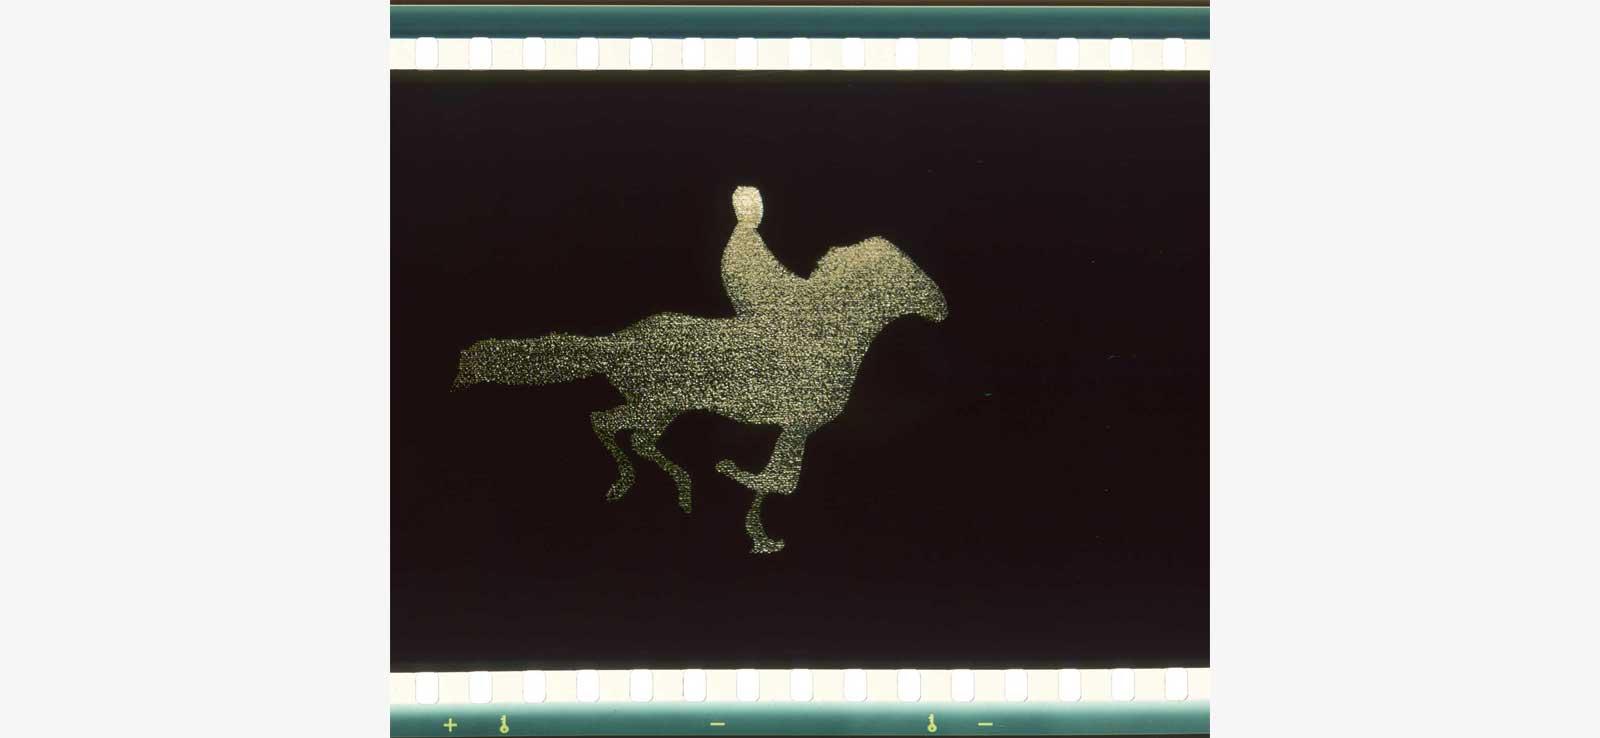 Antoni Pinent Qr Code film frame by frame animation